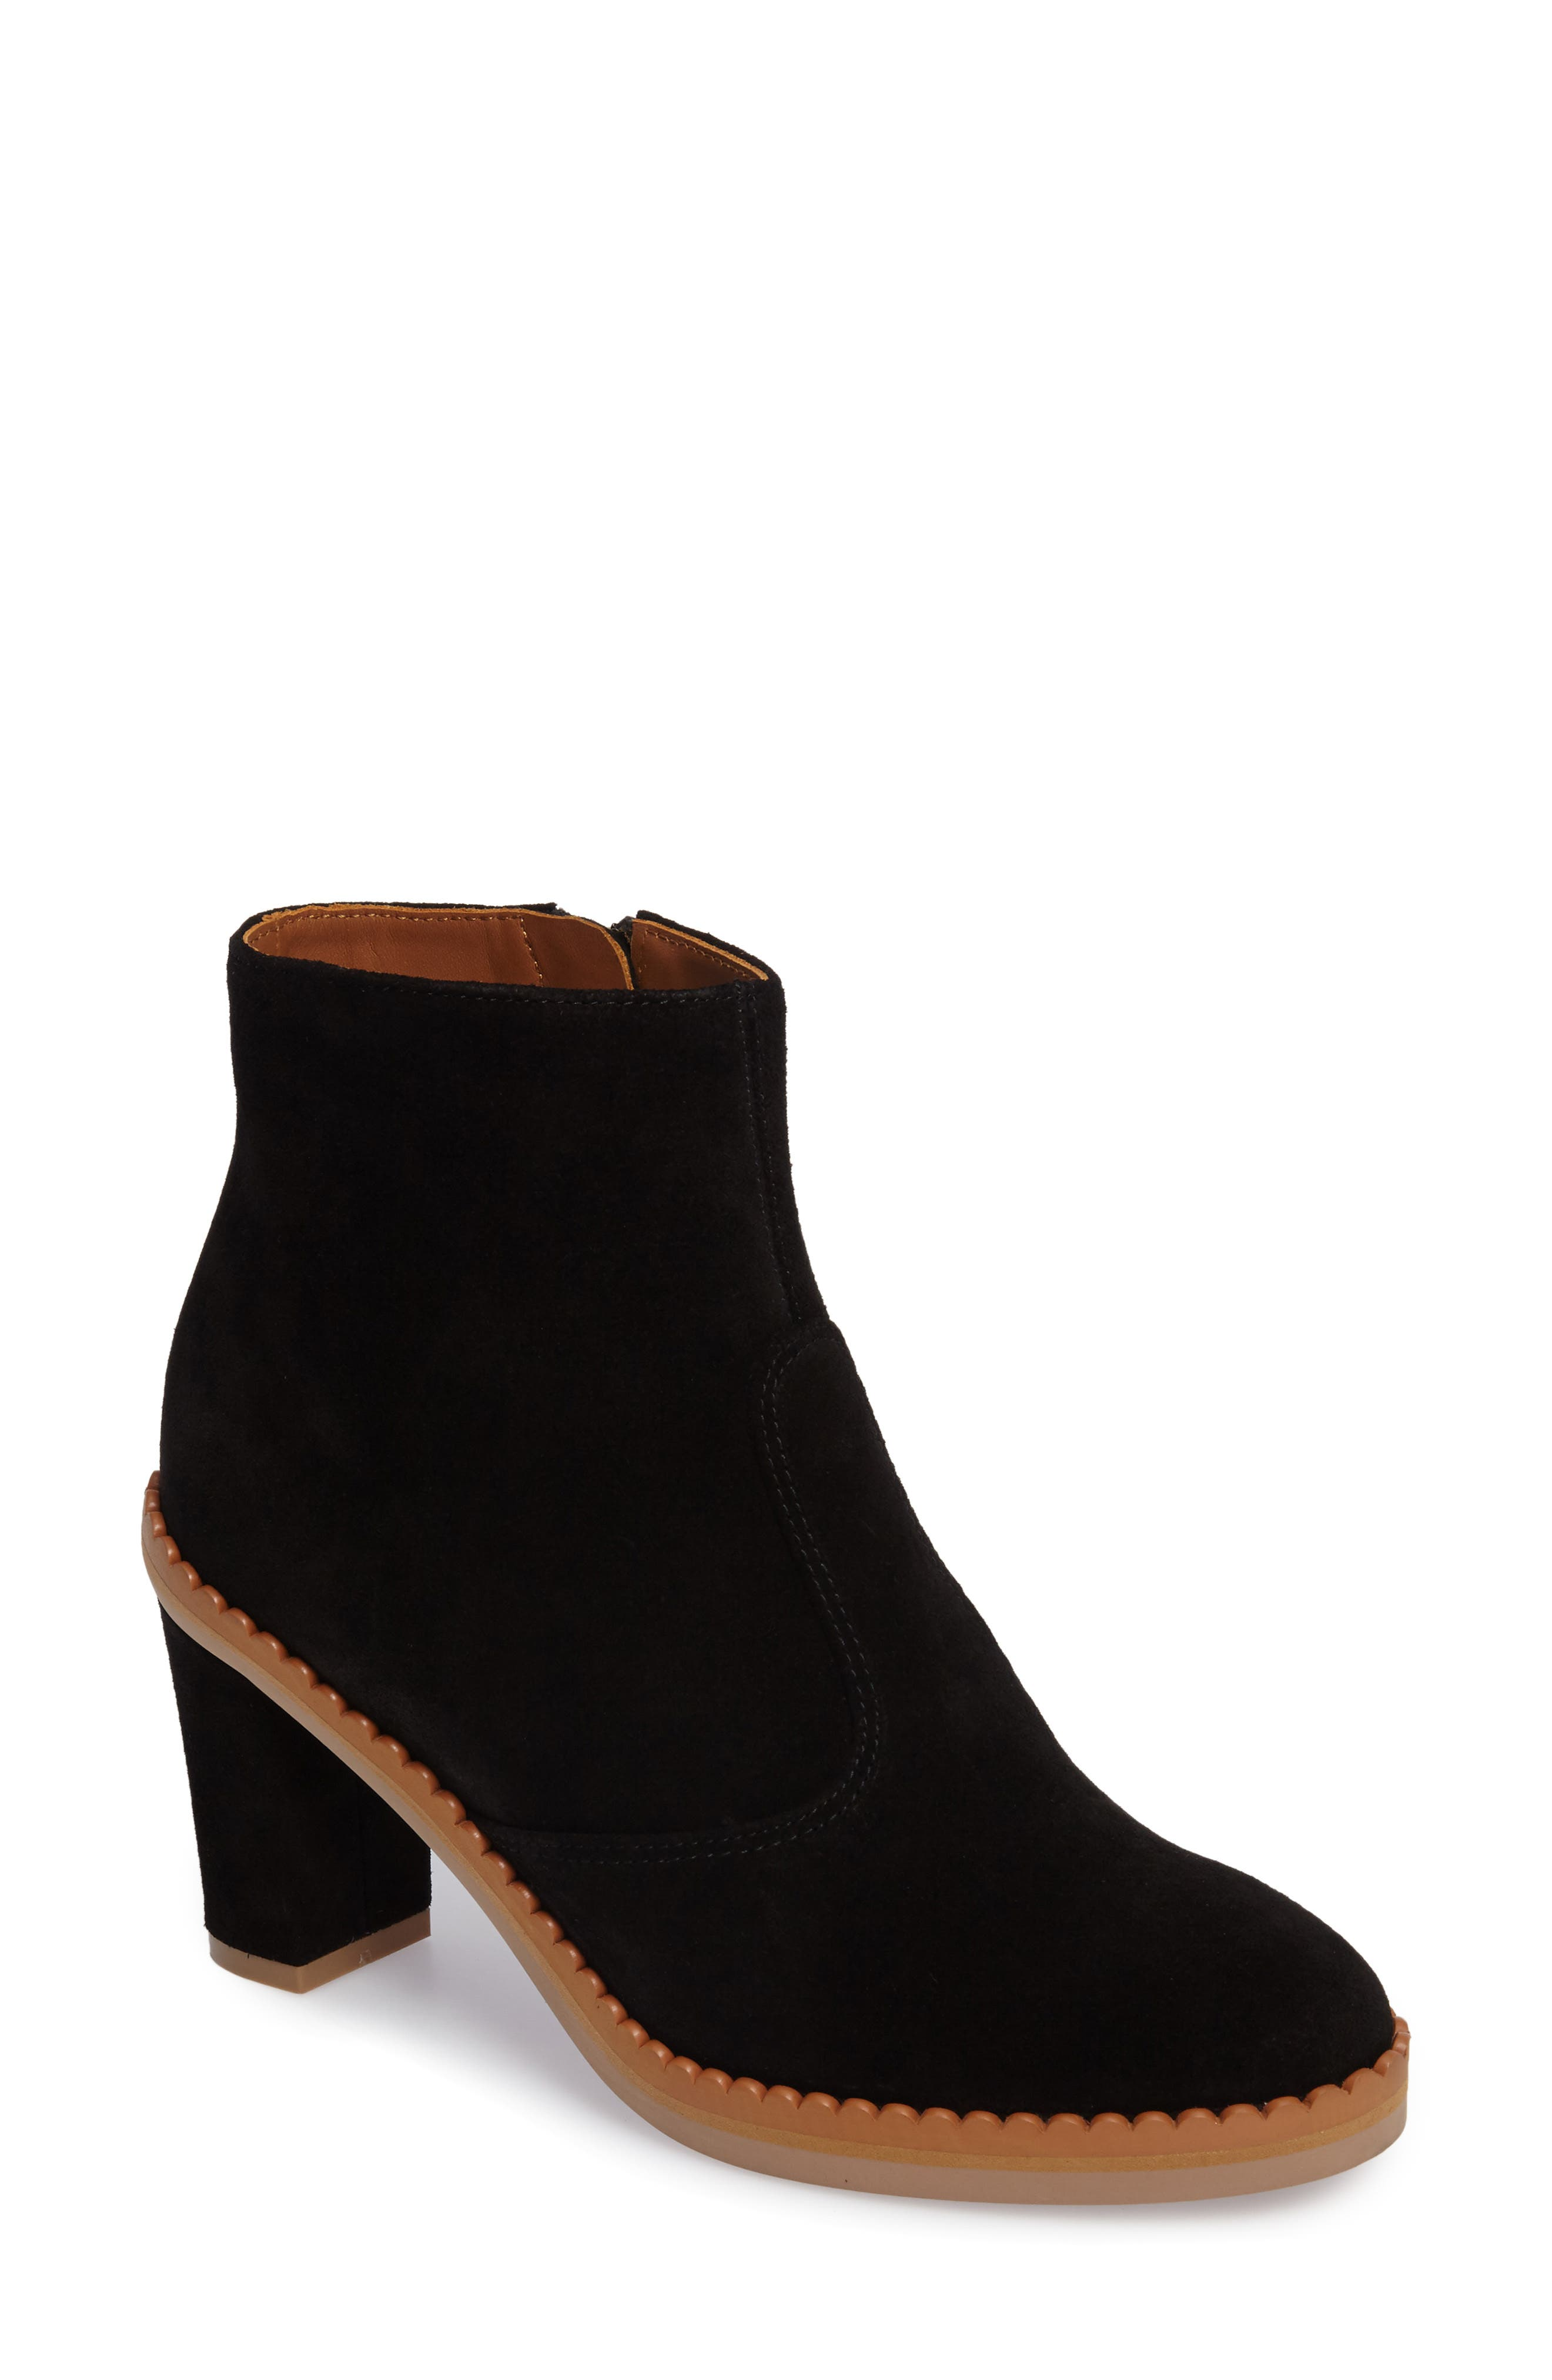 Stasya Block Heel Bootie,                             Main thumbnail 1, color,                             Black